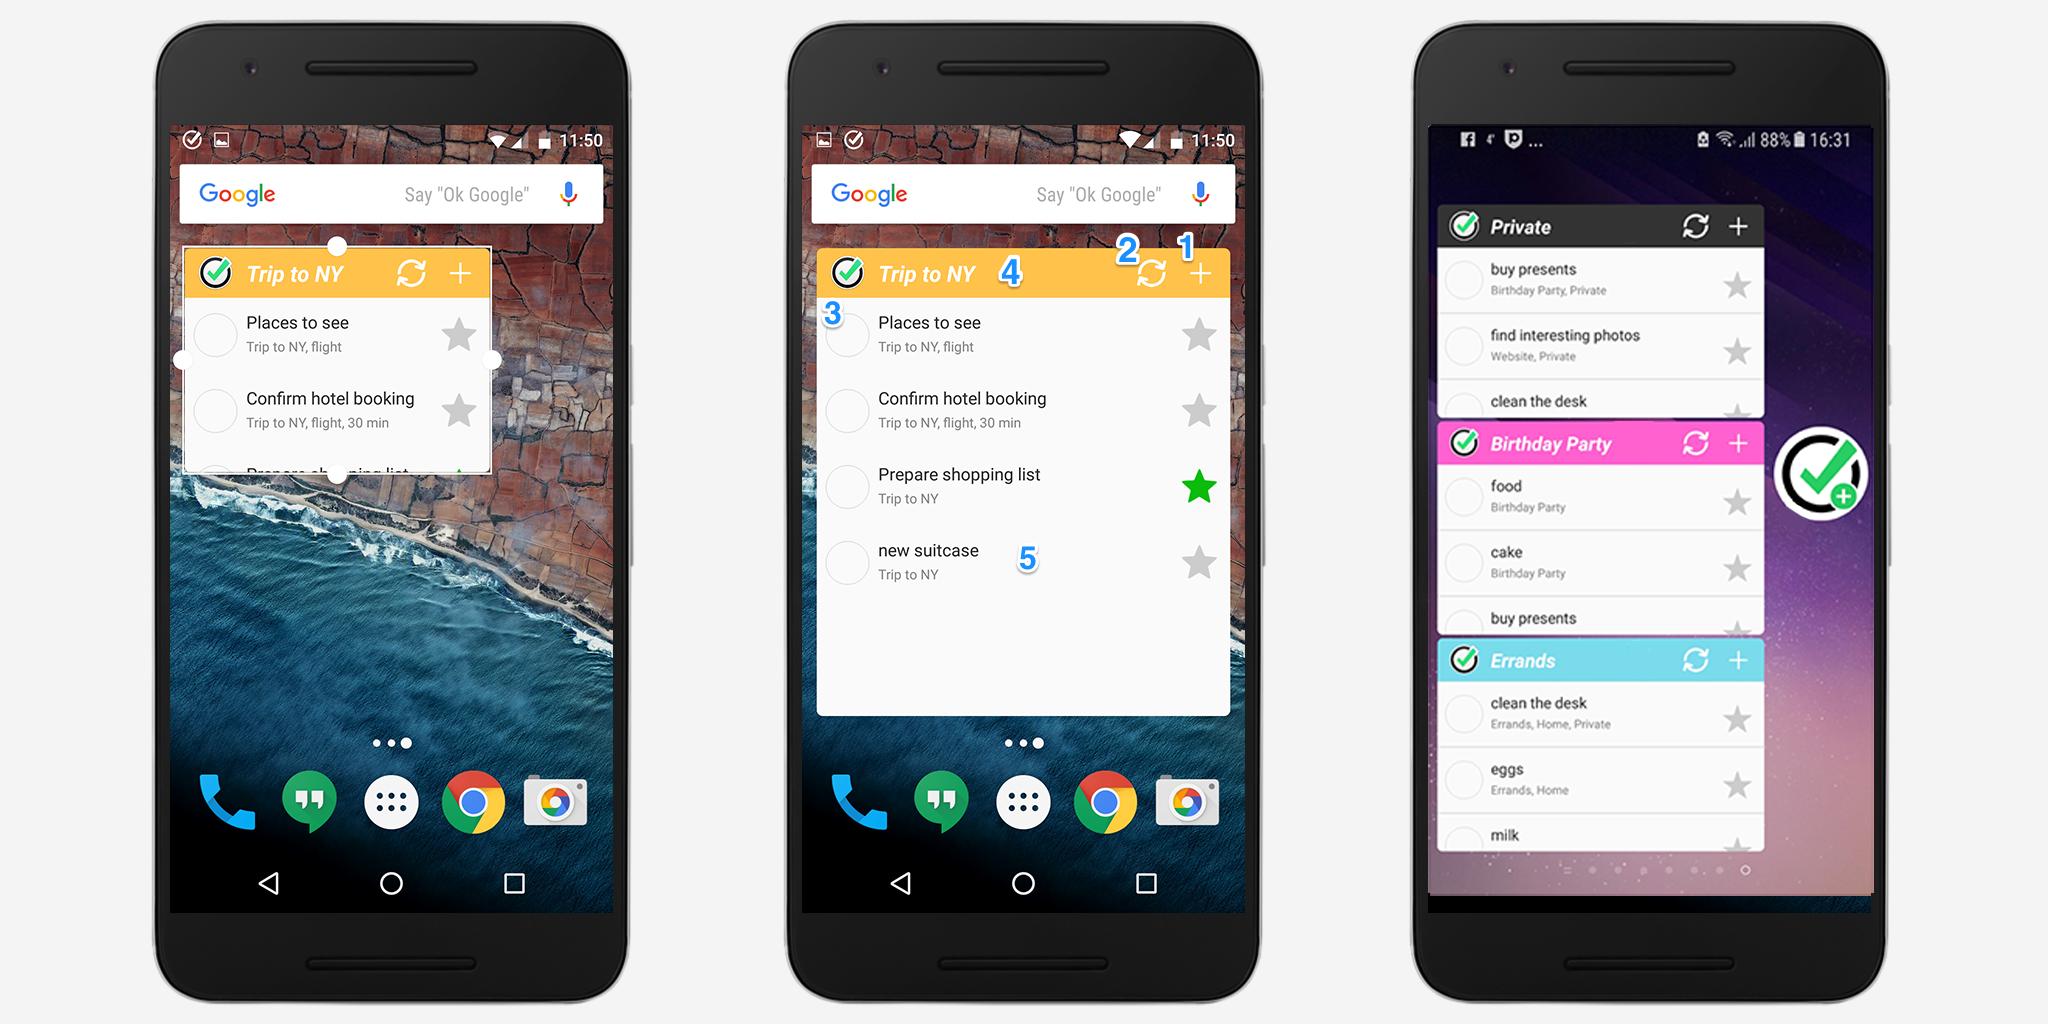 Nozbe on Android :: Nozbe Help